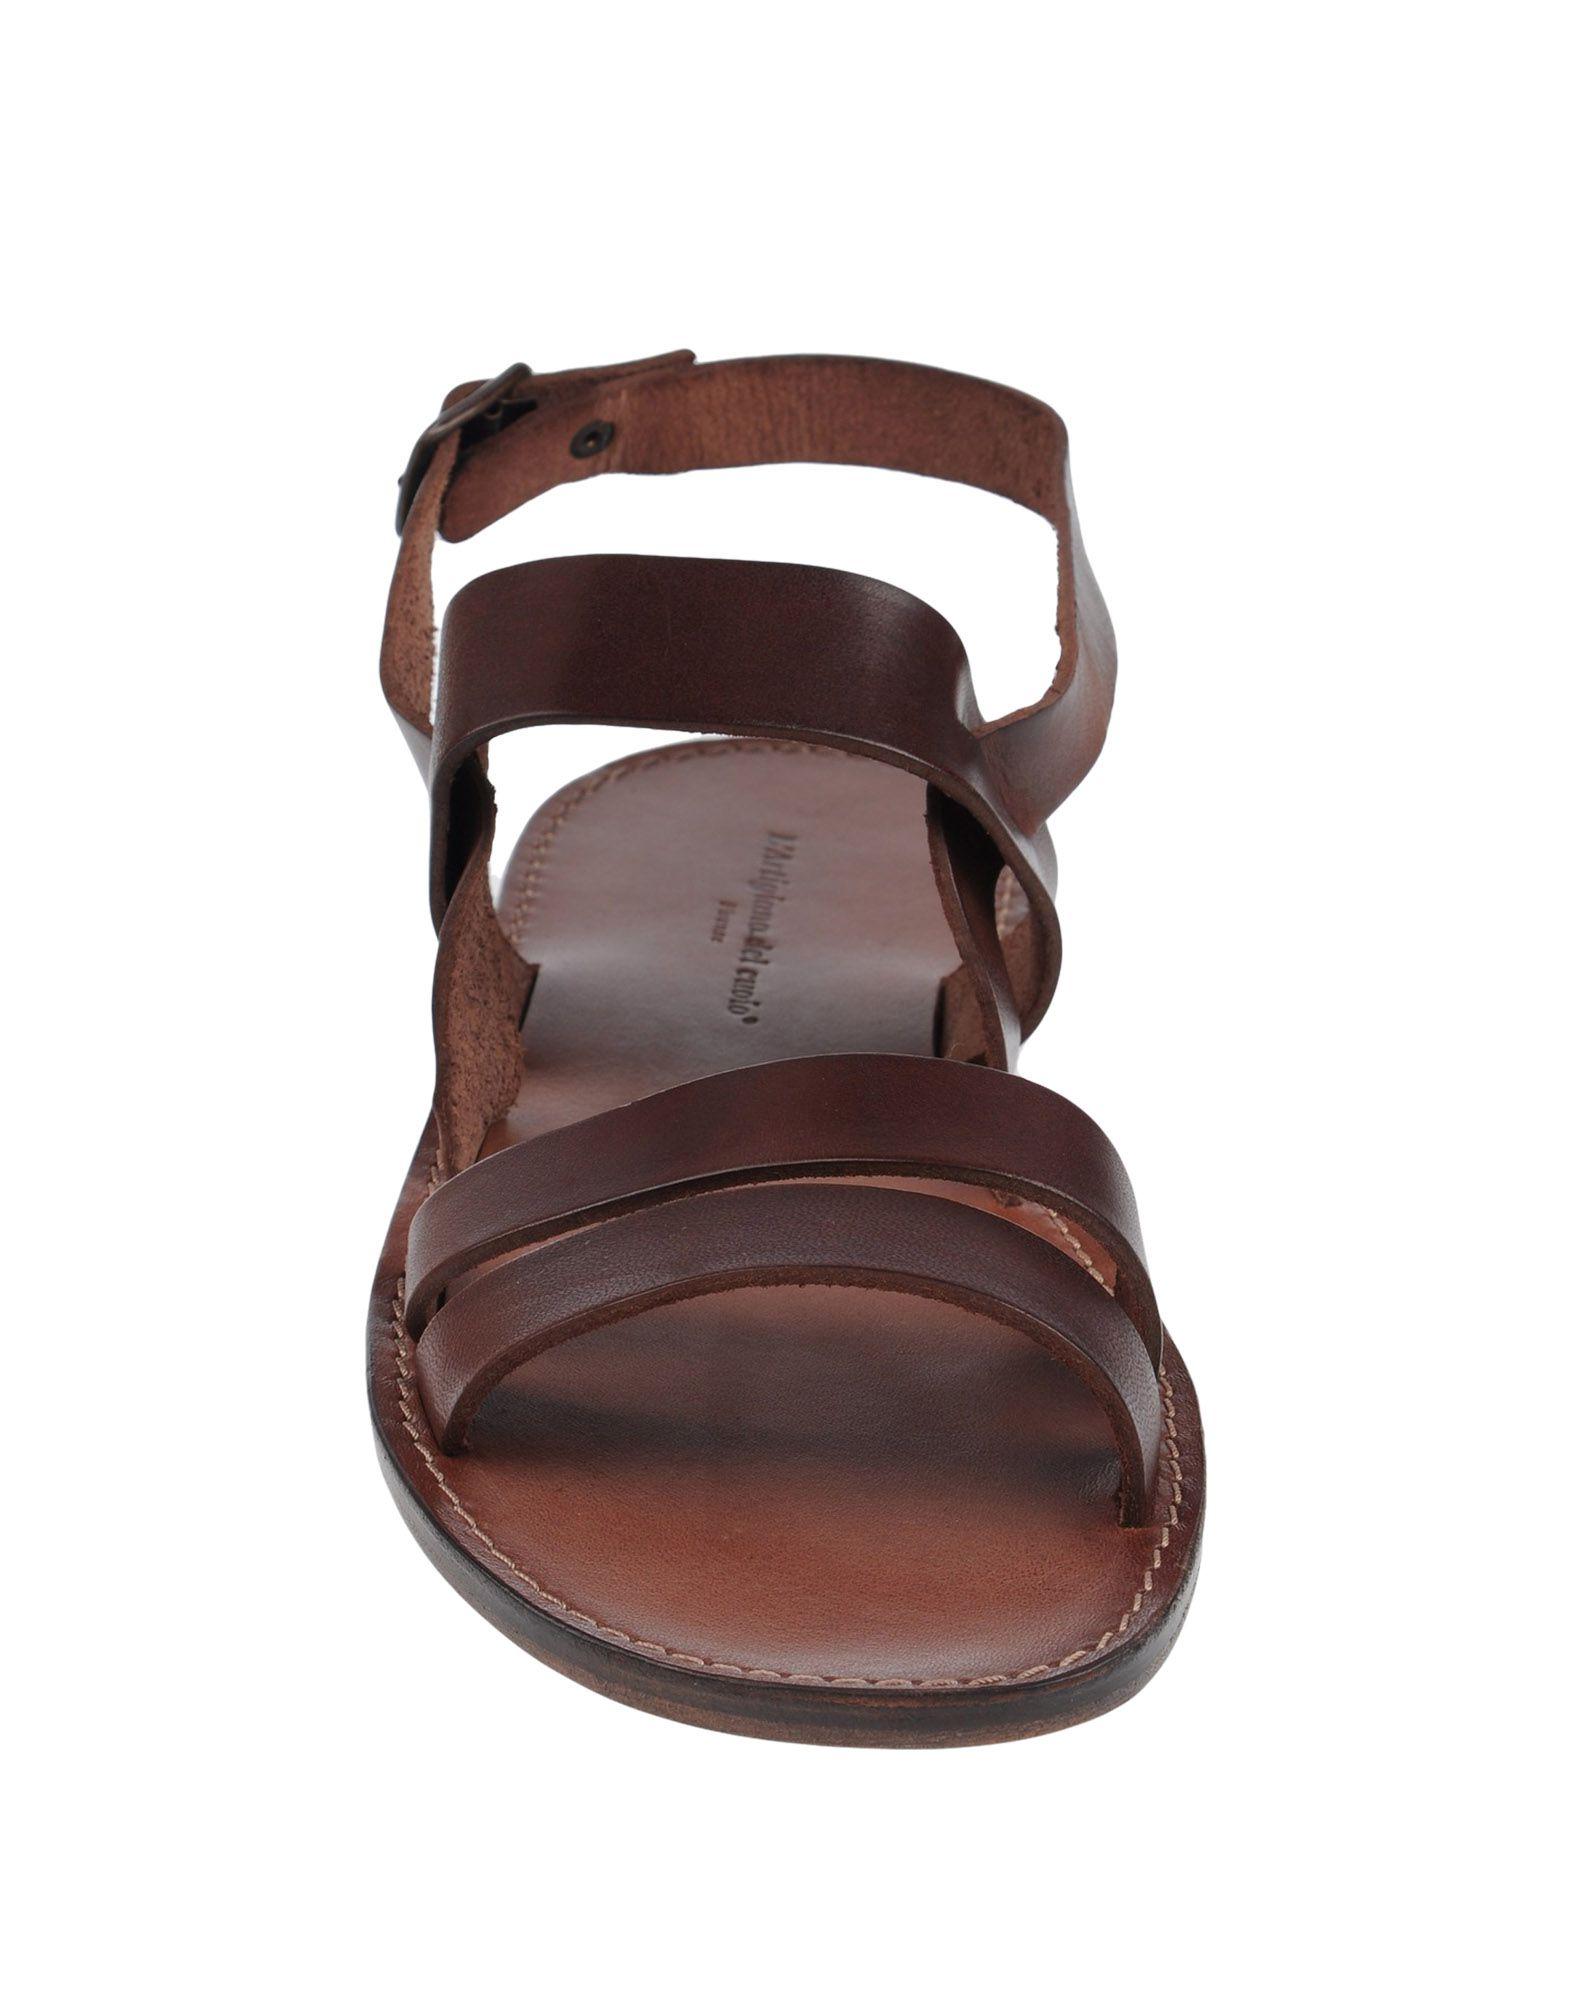 Sandales Lartigiano Del Cuoio Homme - Sandales Lartigiano Del Cuoio sur